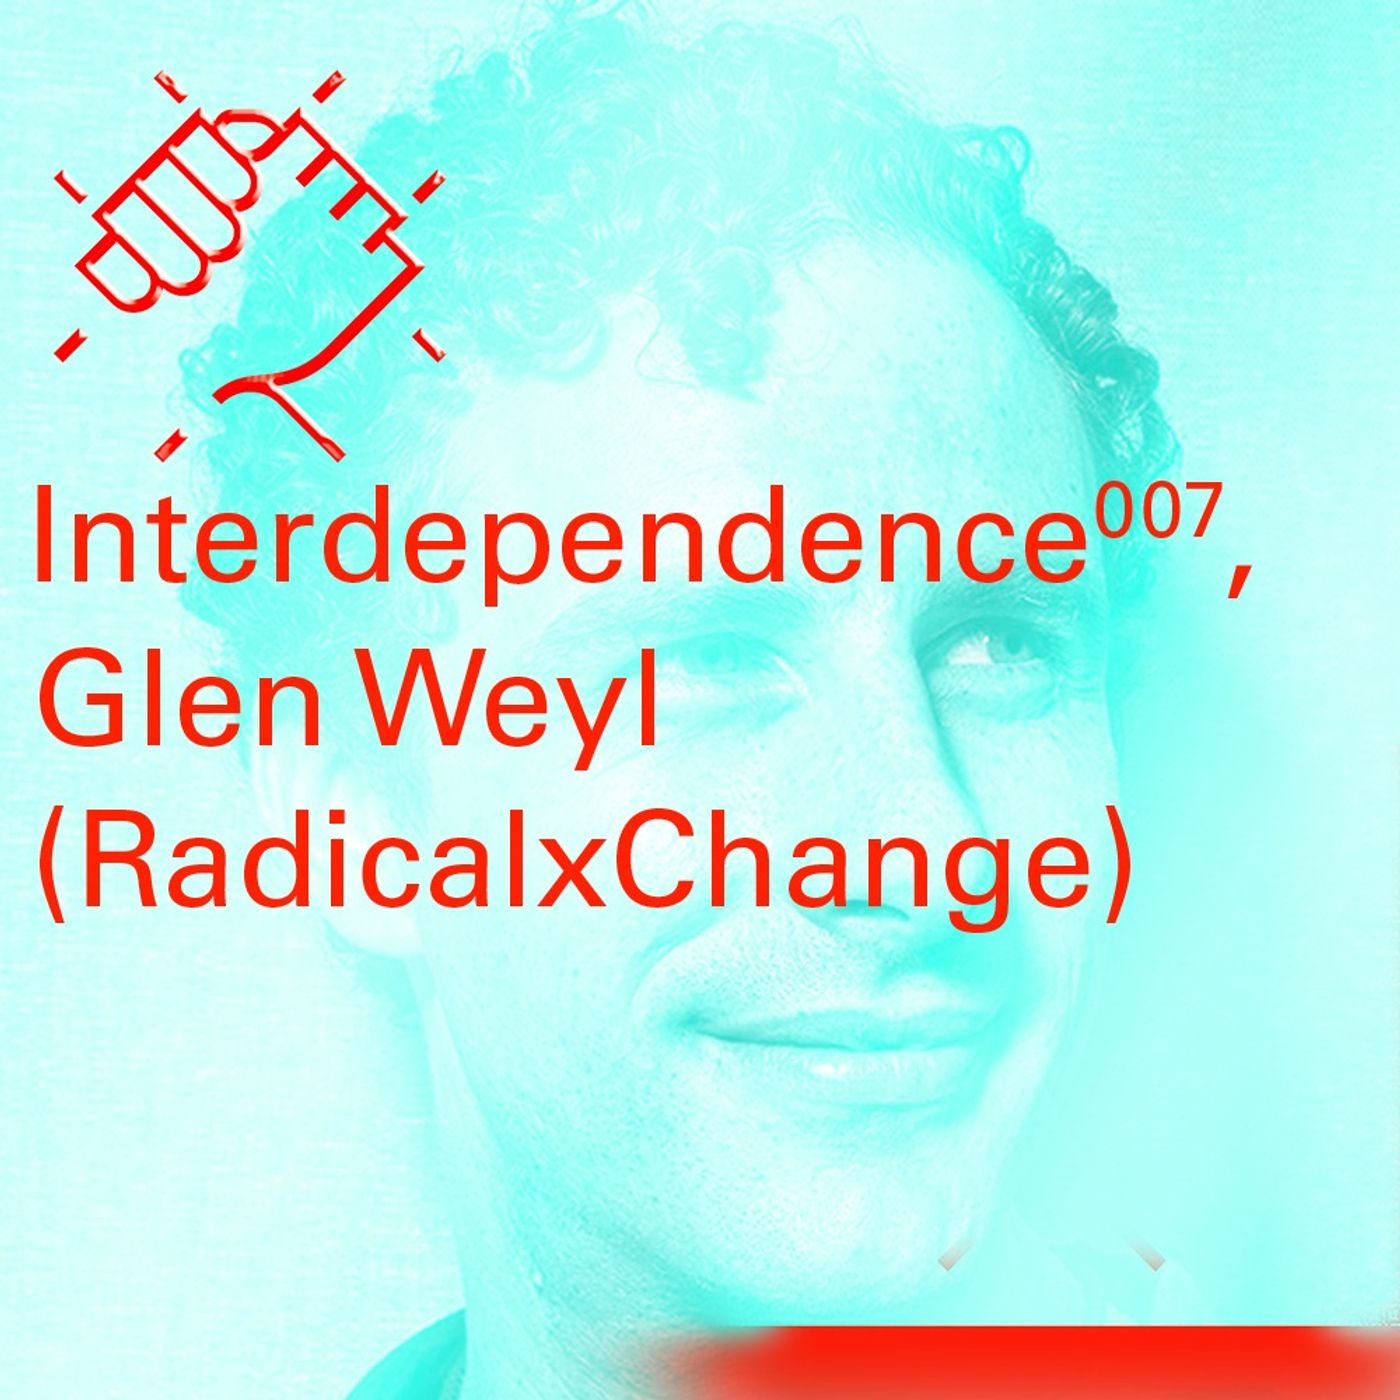 Interdependence 7 : Glen Weyl (RadicalxChange)